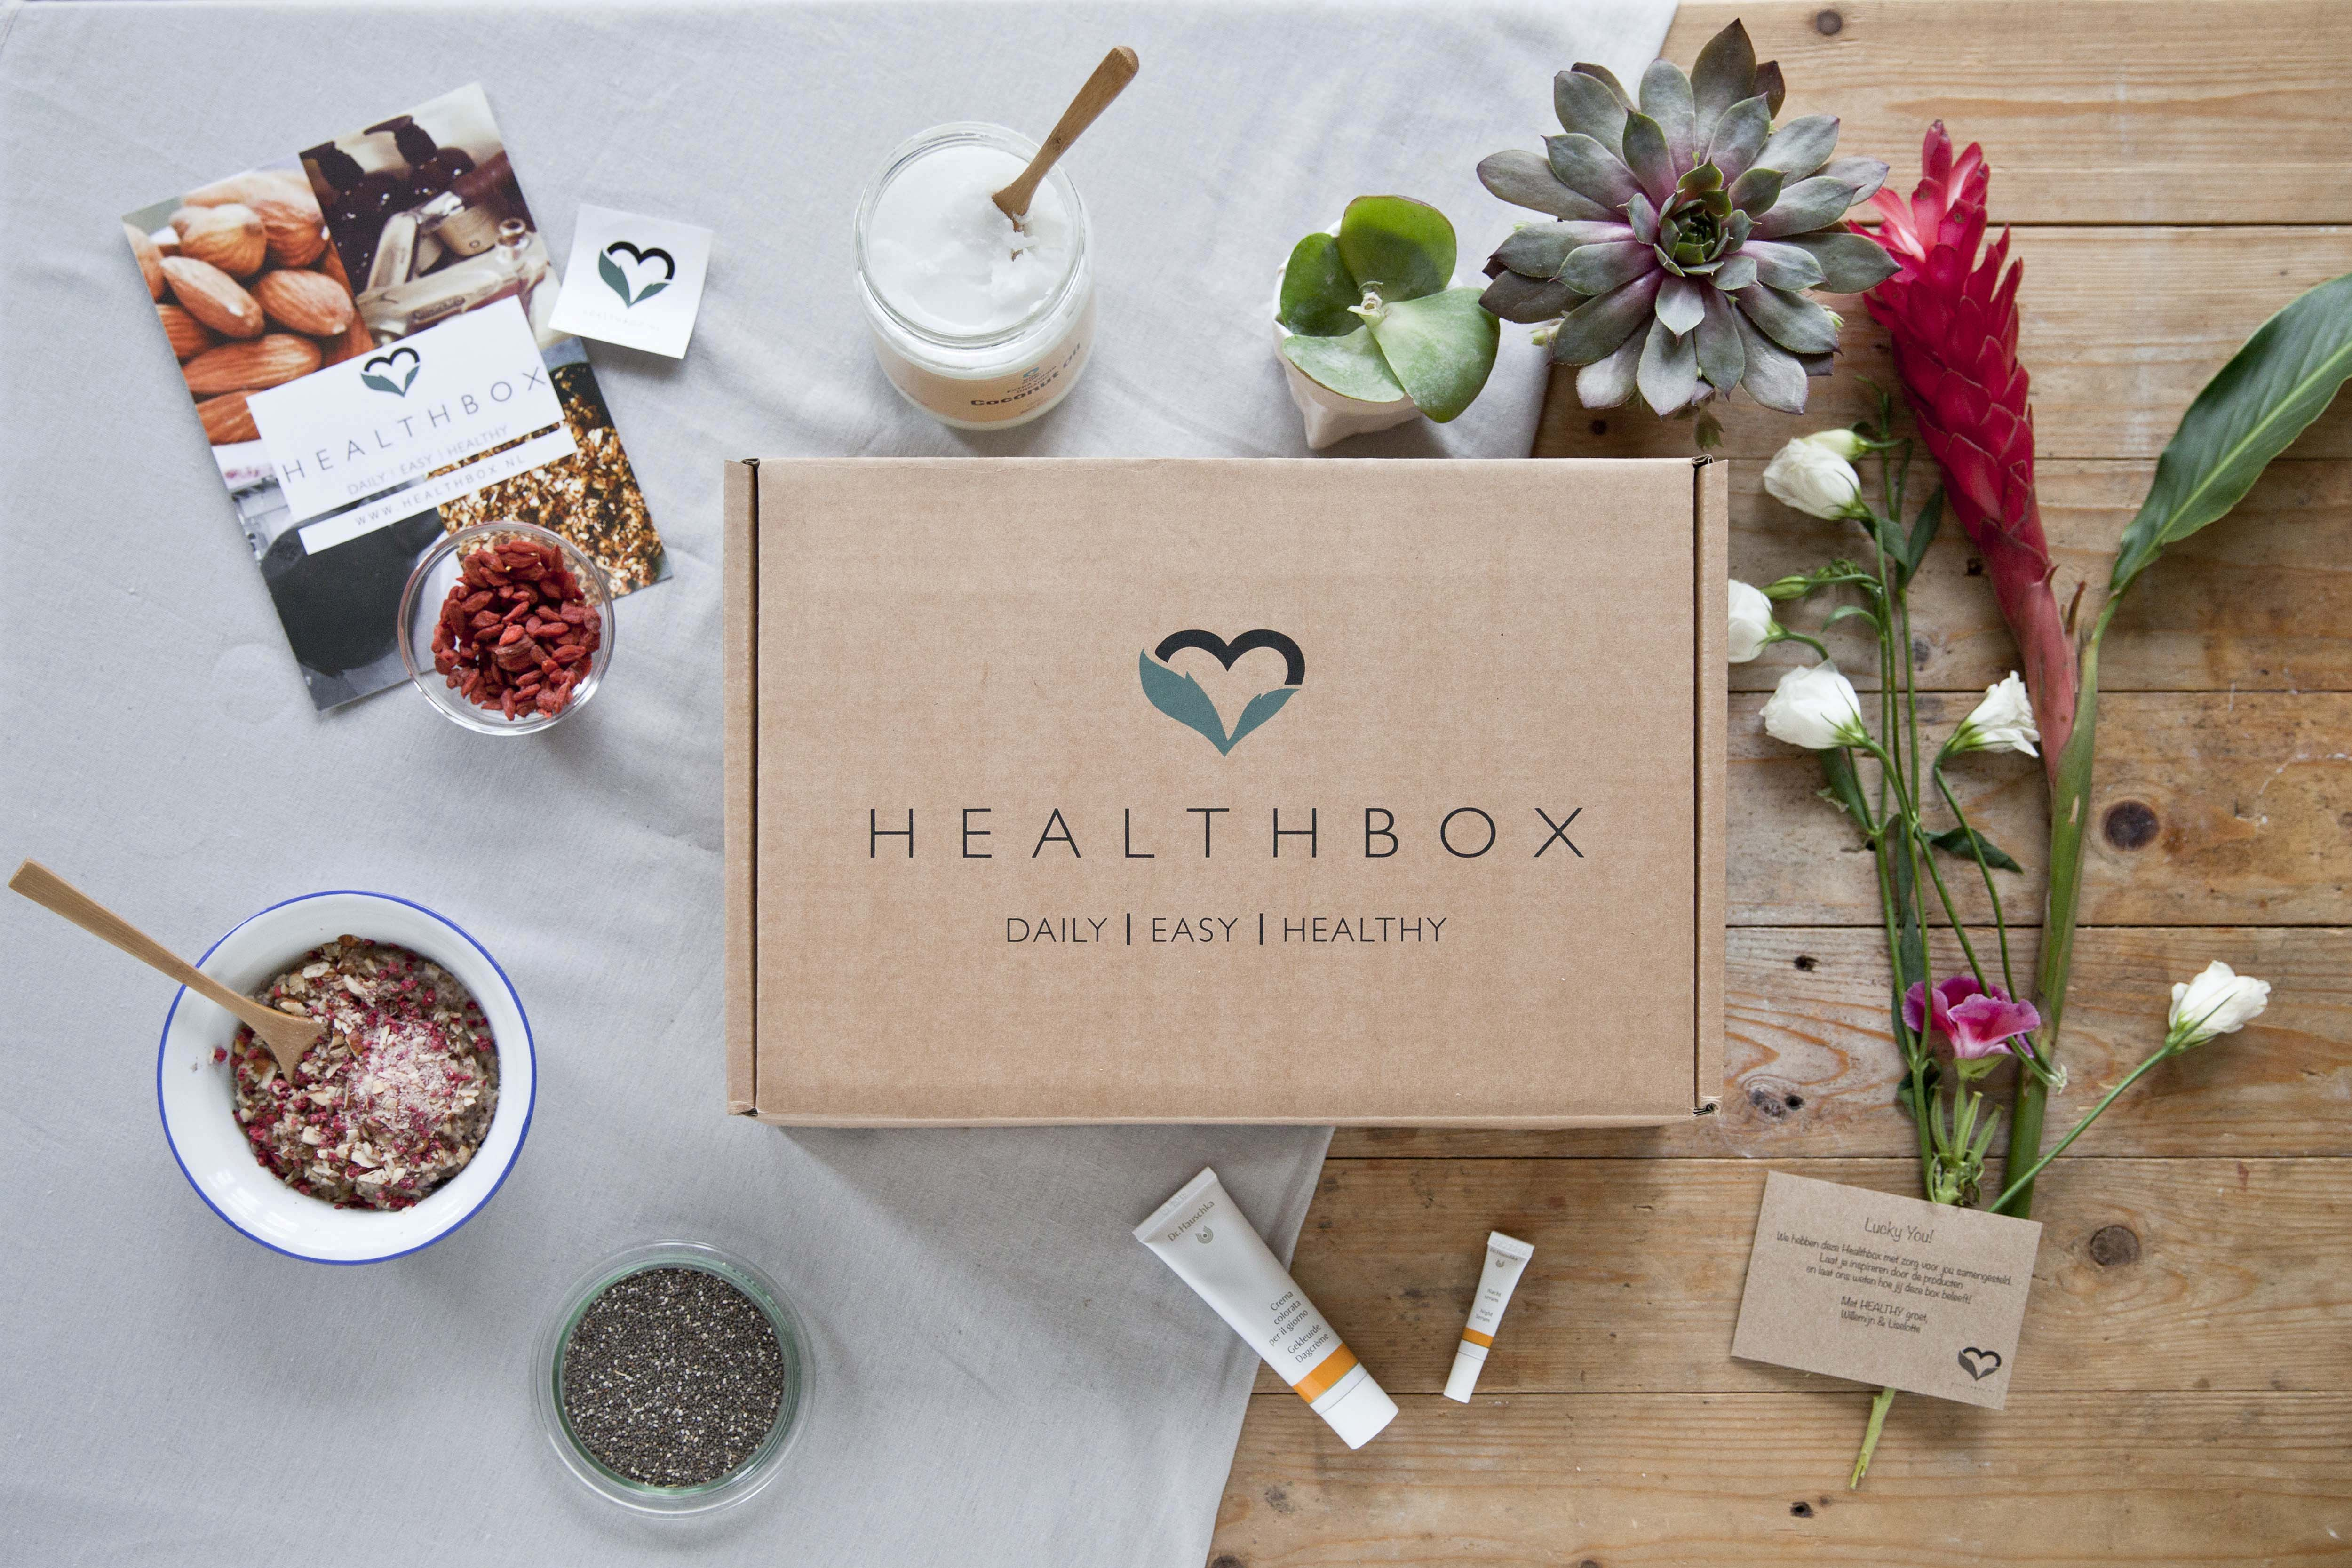 Healthbox-Health freaks Liselotte Wannijn en Willemijn Kornelis